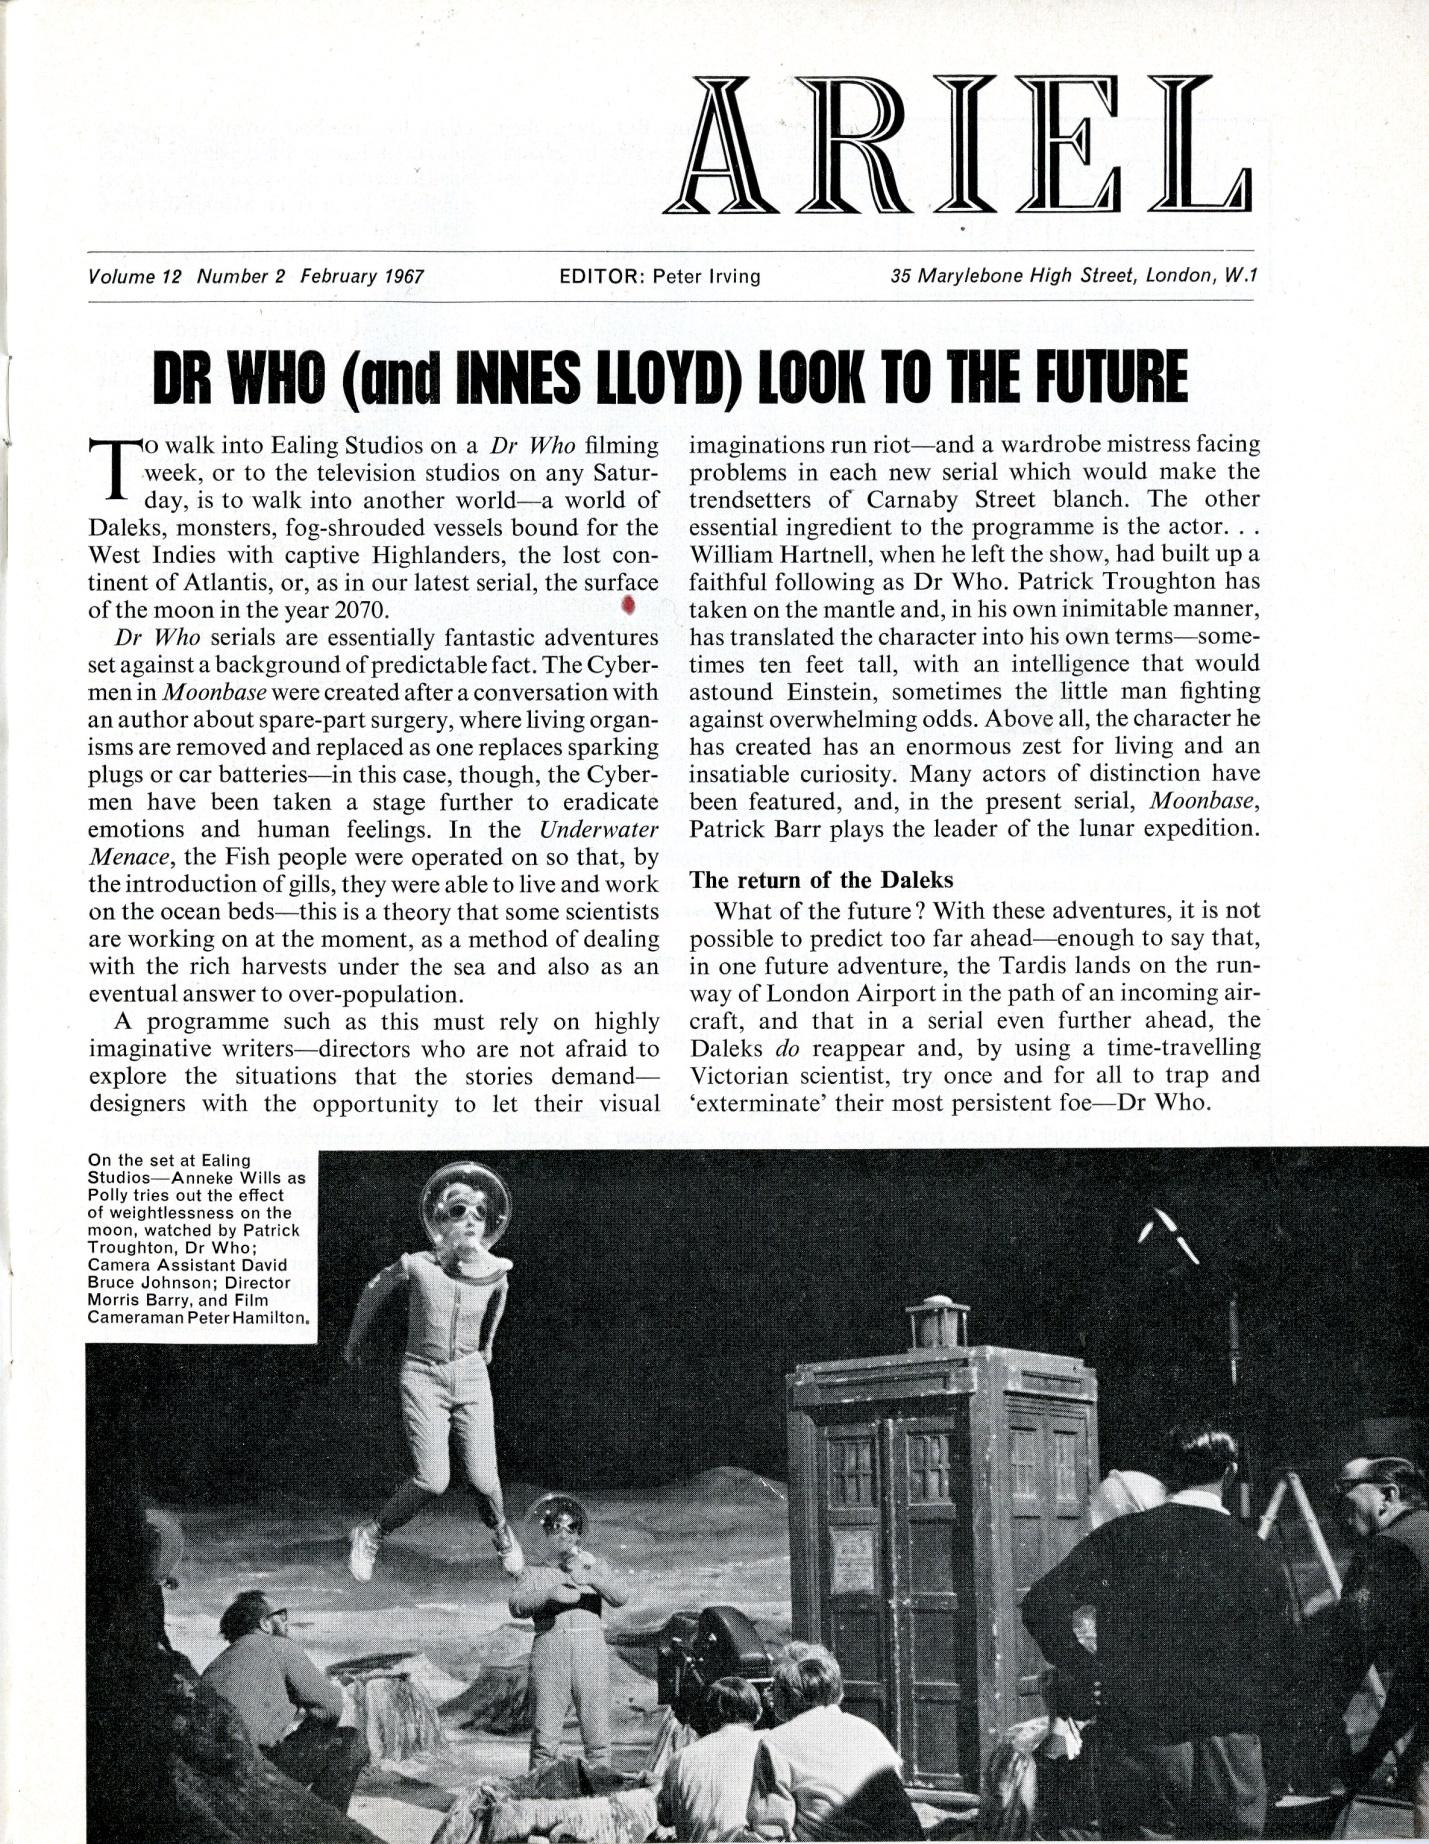 Ariel, vol. 12, number 2, February 1967